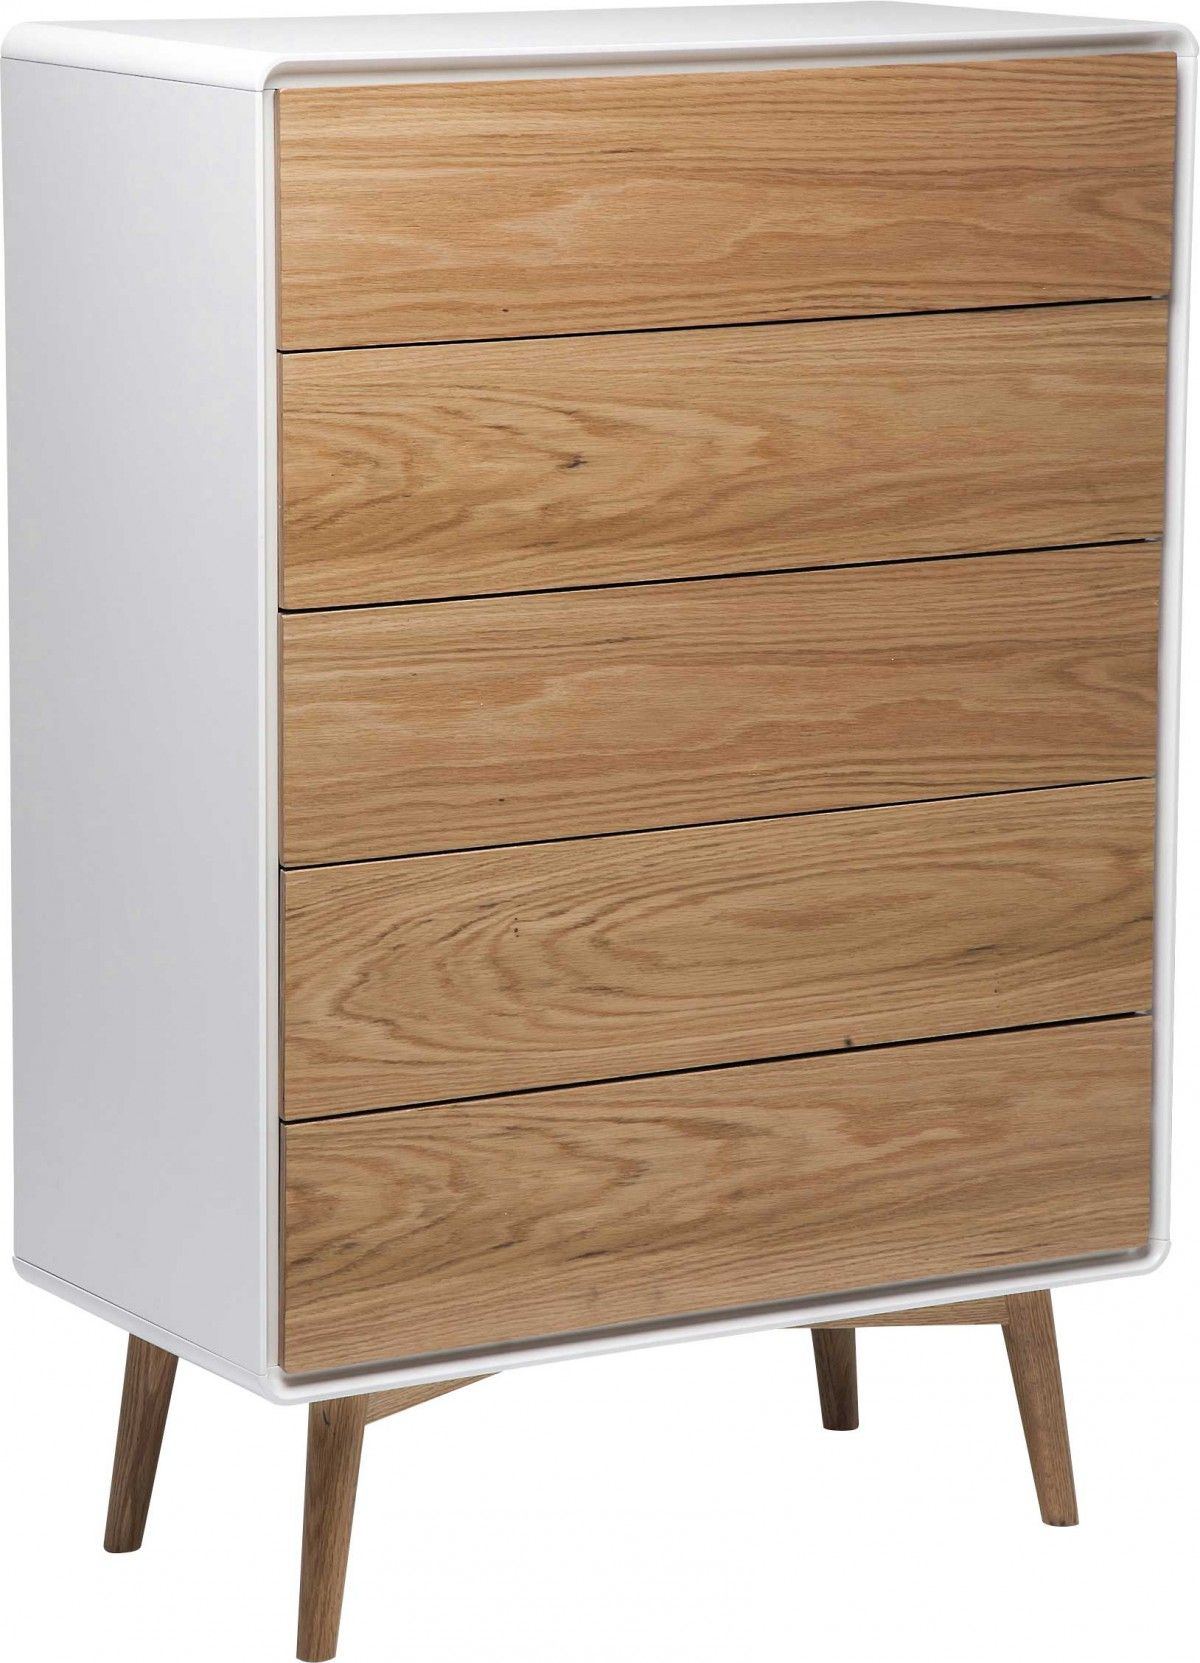 KARE.de - KARE Möbel kaufen - KARE Design - Highboards -Hochkommode ...